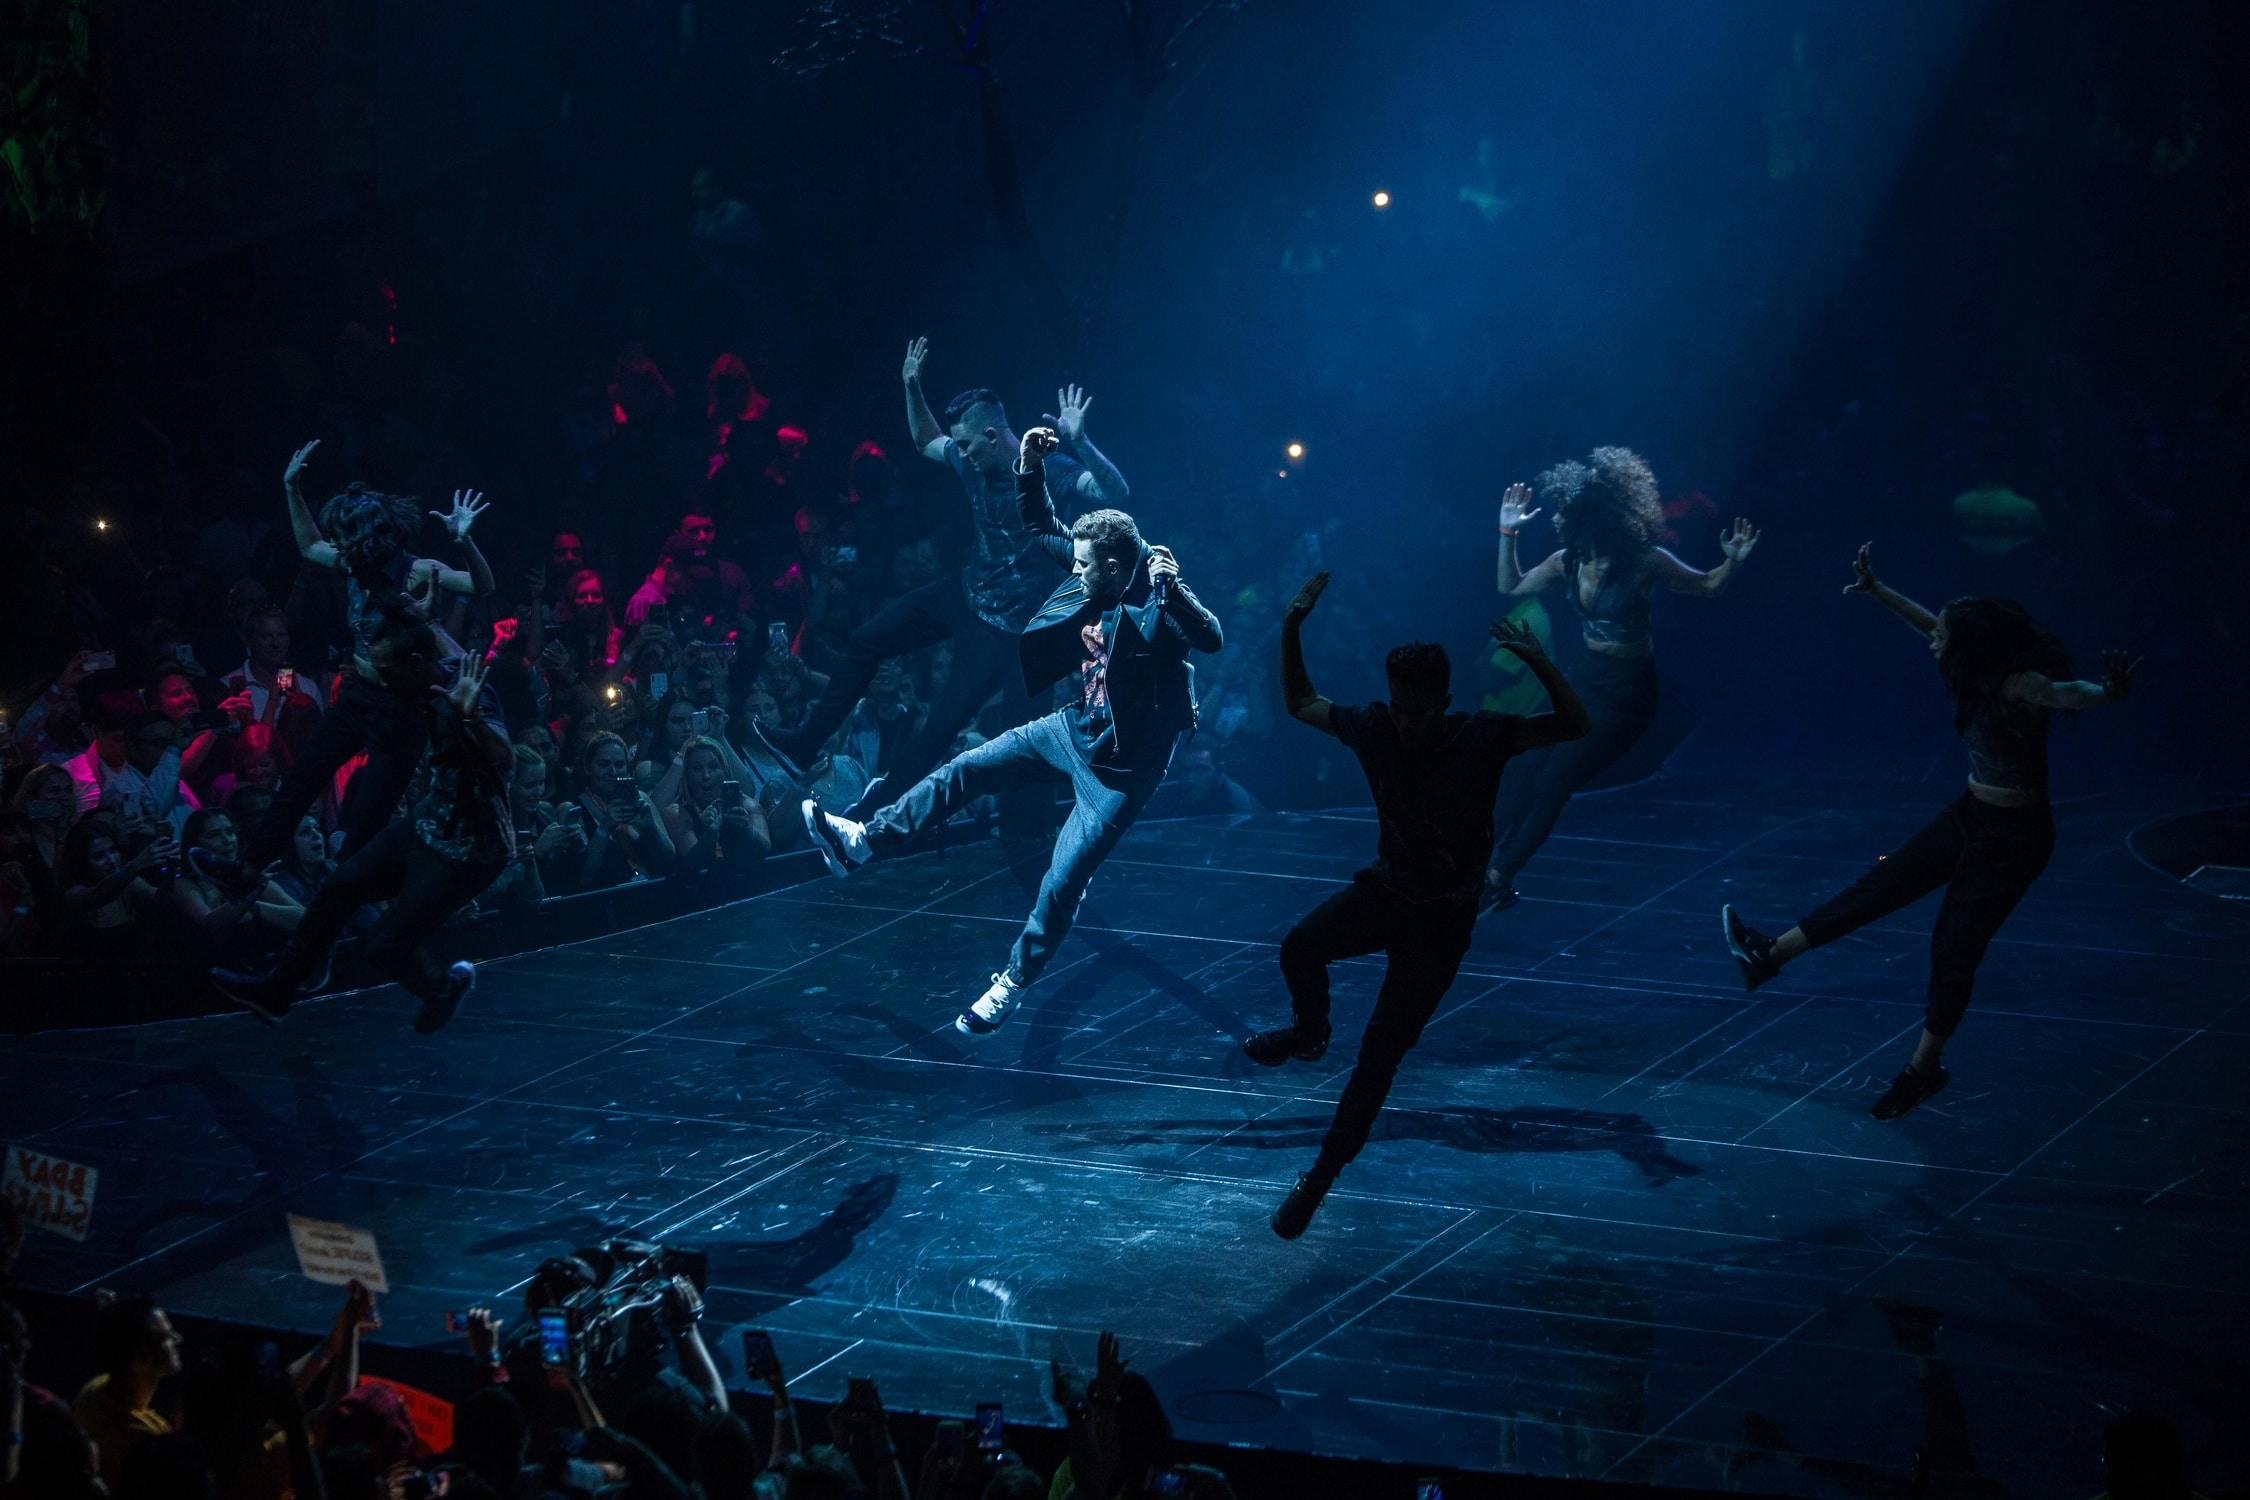 October 2018: Justin Timberlake @ Scotiabank Arena